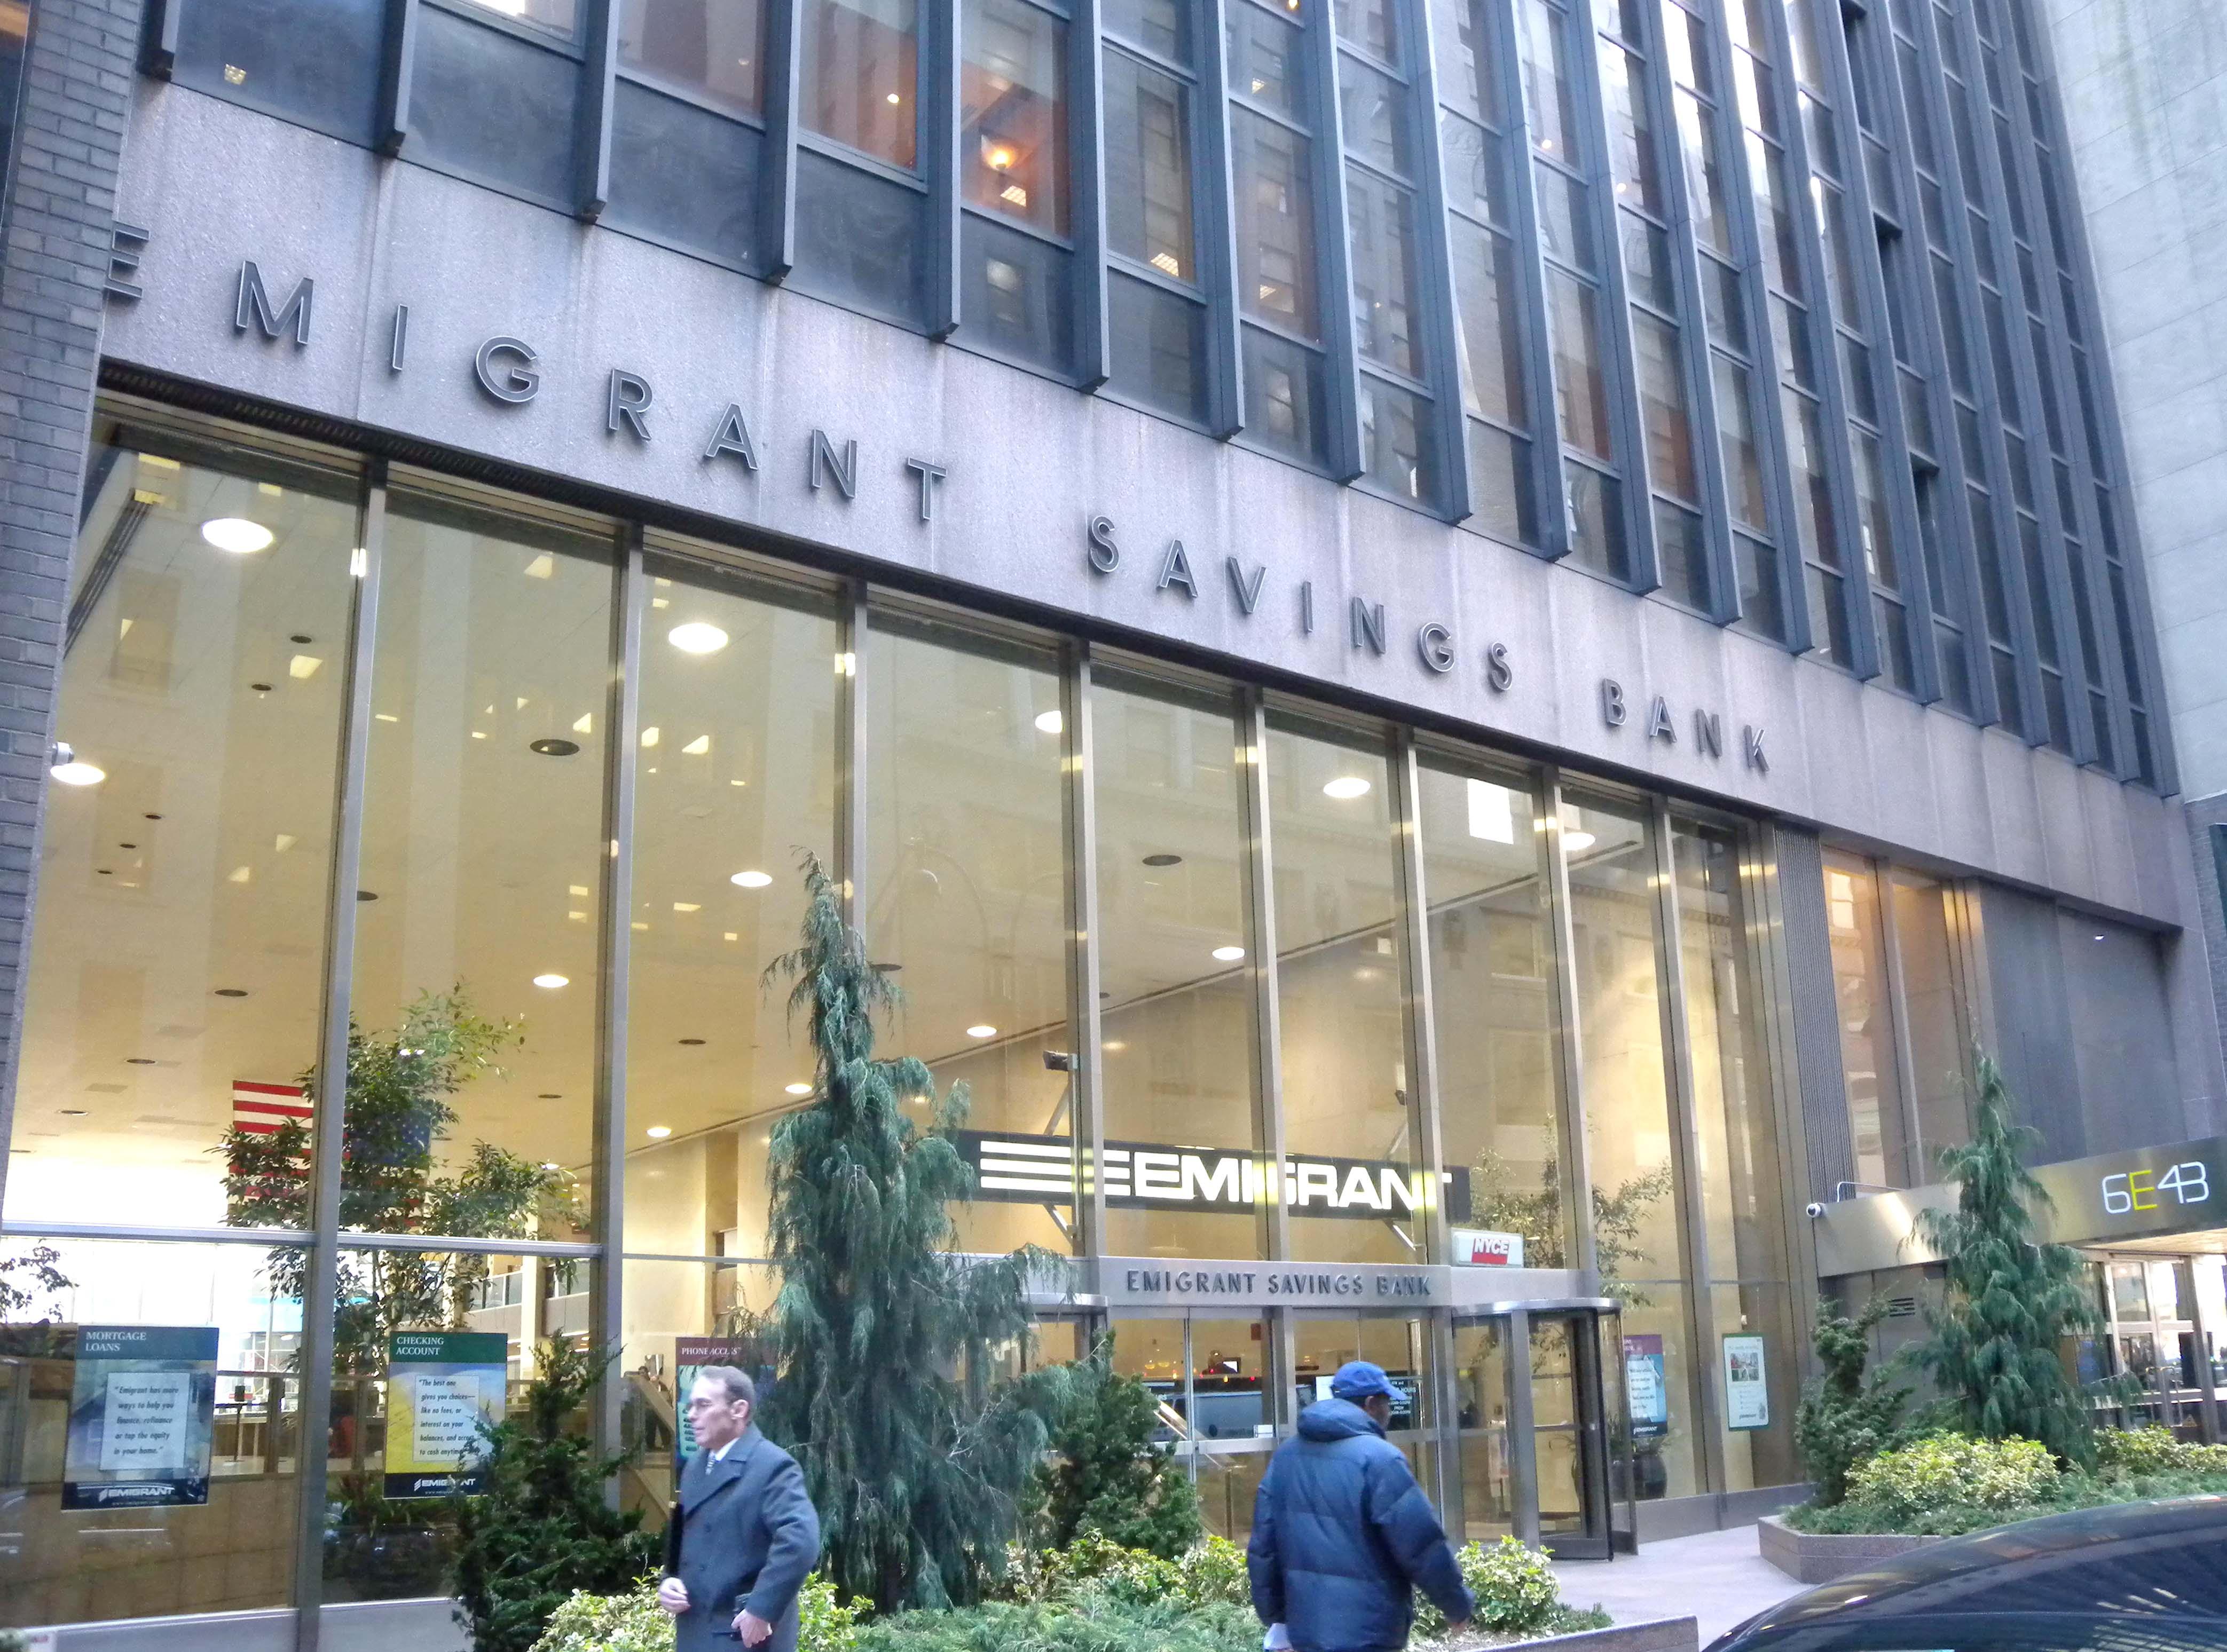 Emigrant_Savings_Bank_6E43_jeh